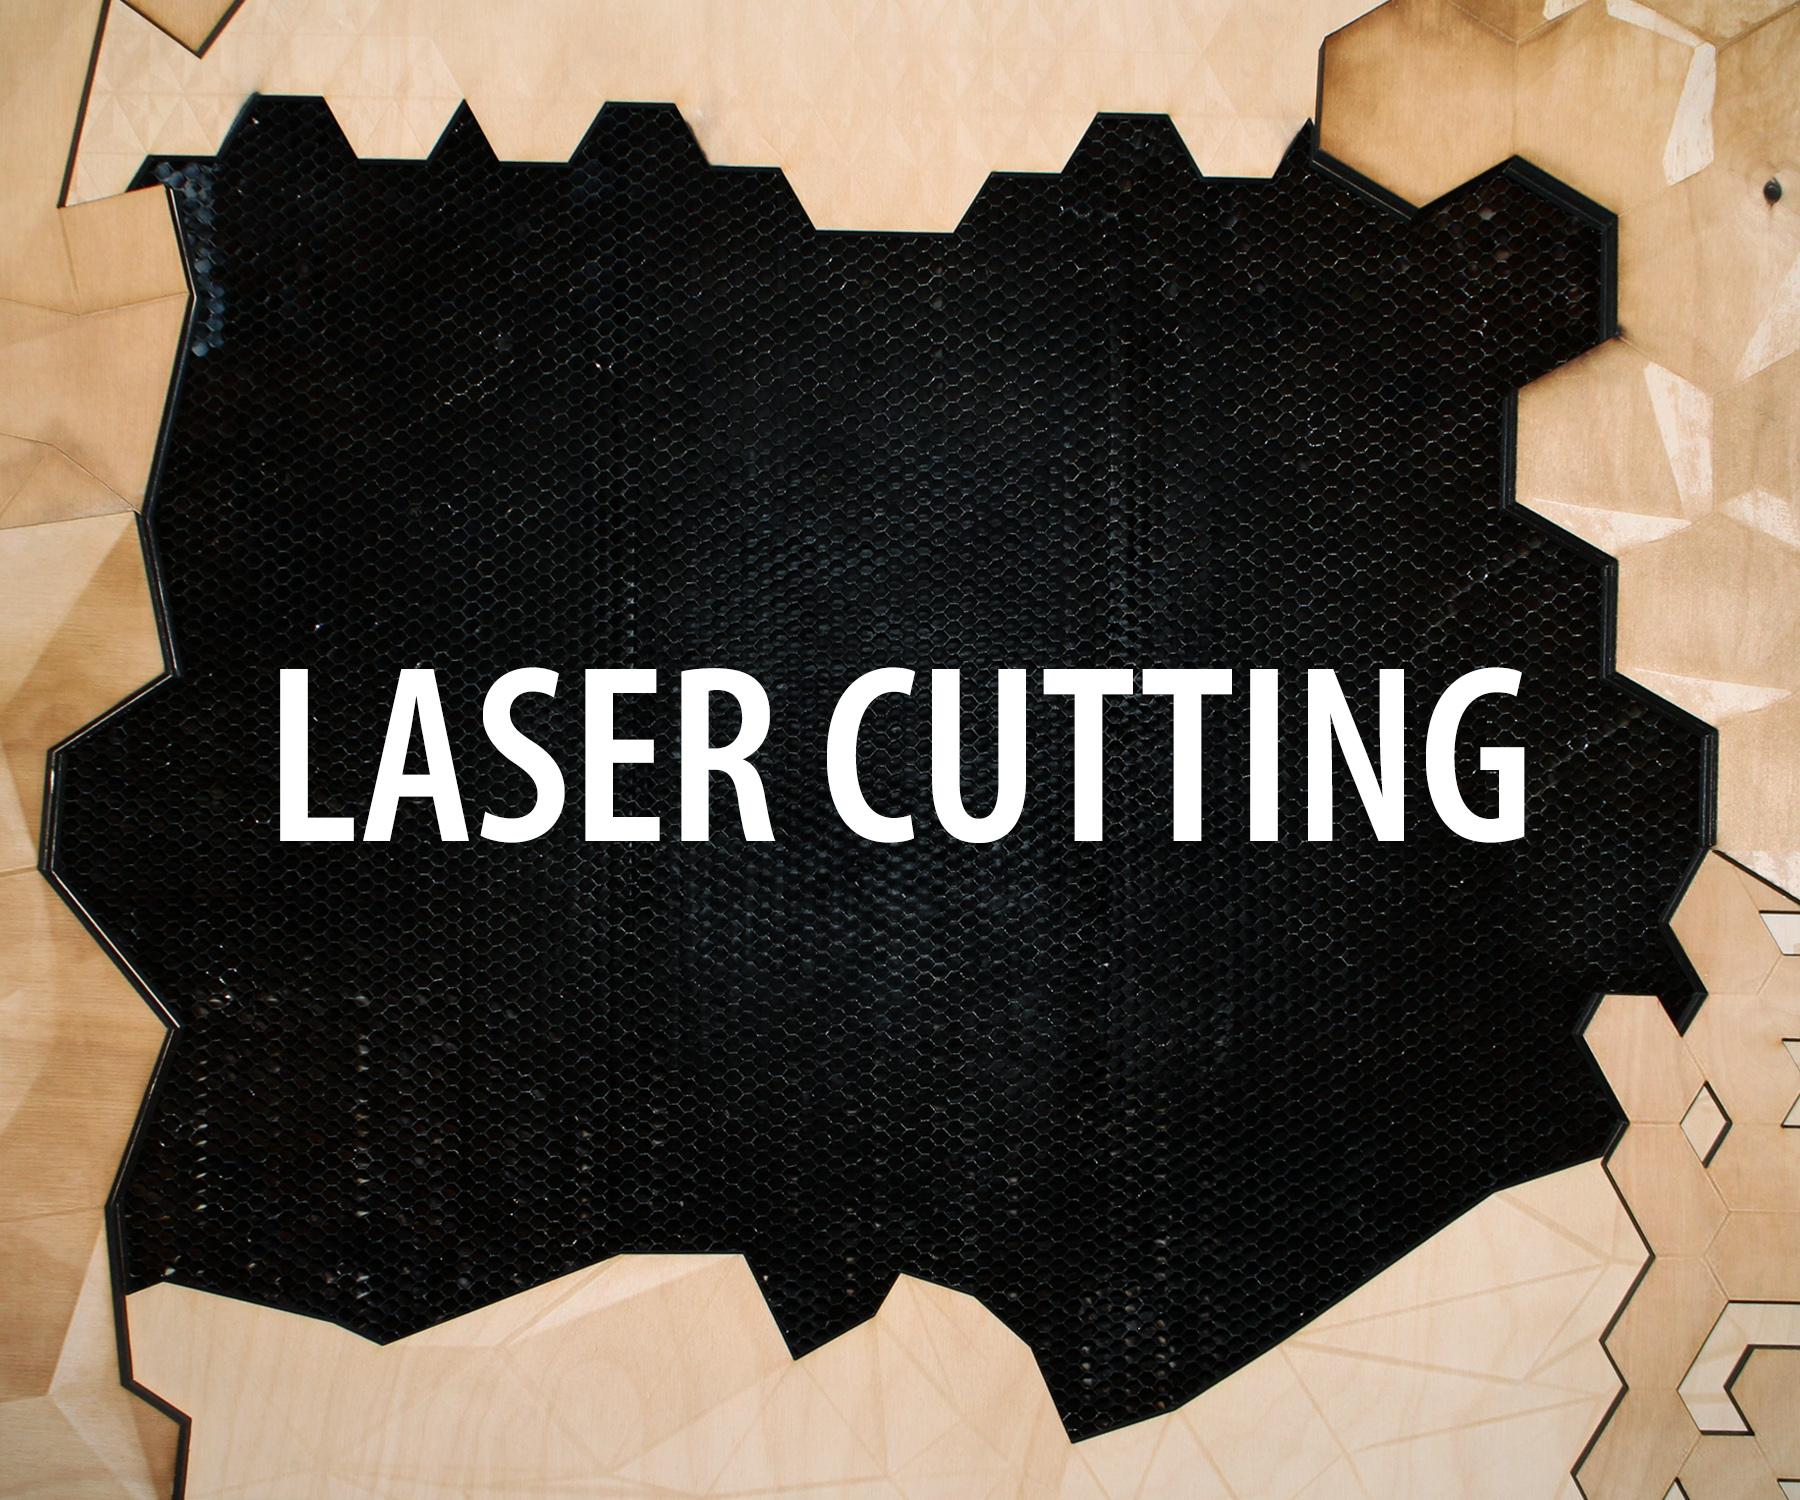 Laser Cutting Class